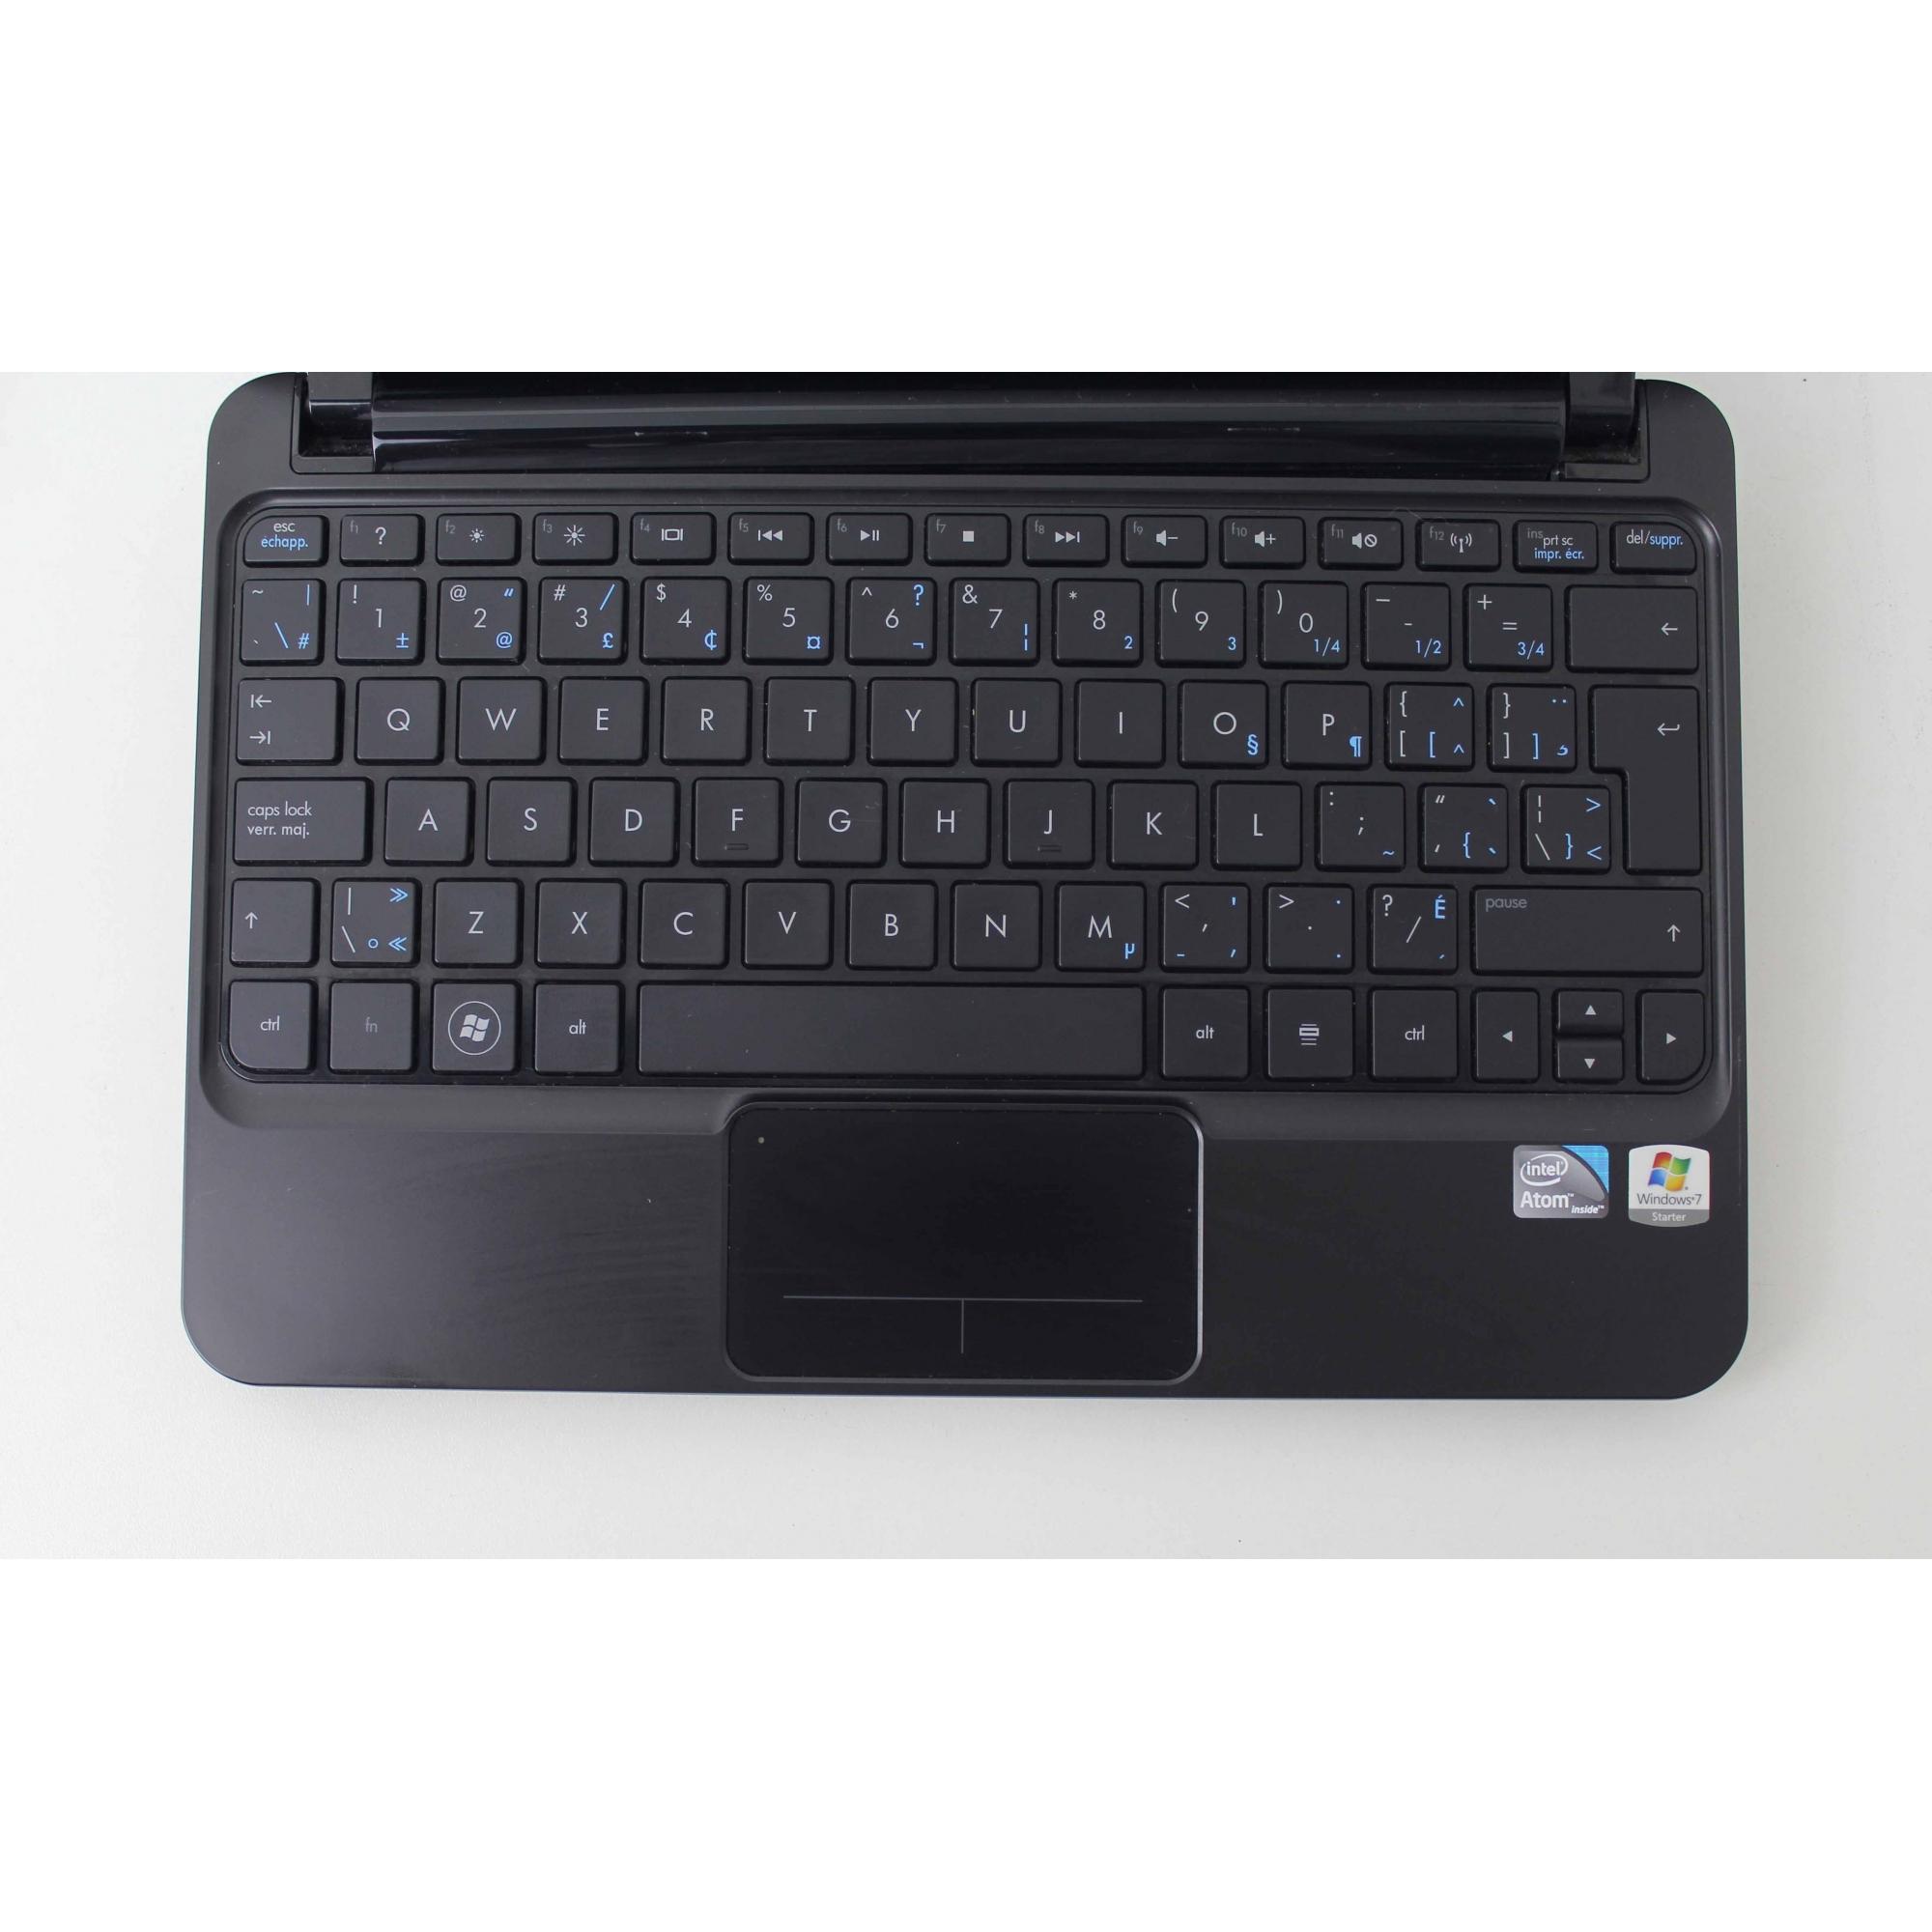 Netbook HP Mini 210 - 109NR 10.1'' Intel Atom CPU N455 1.66GHz 2GB HD-250GB